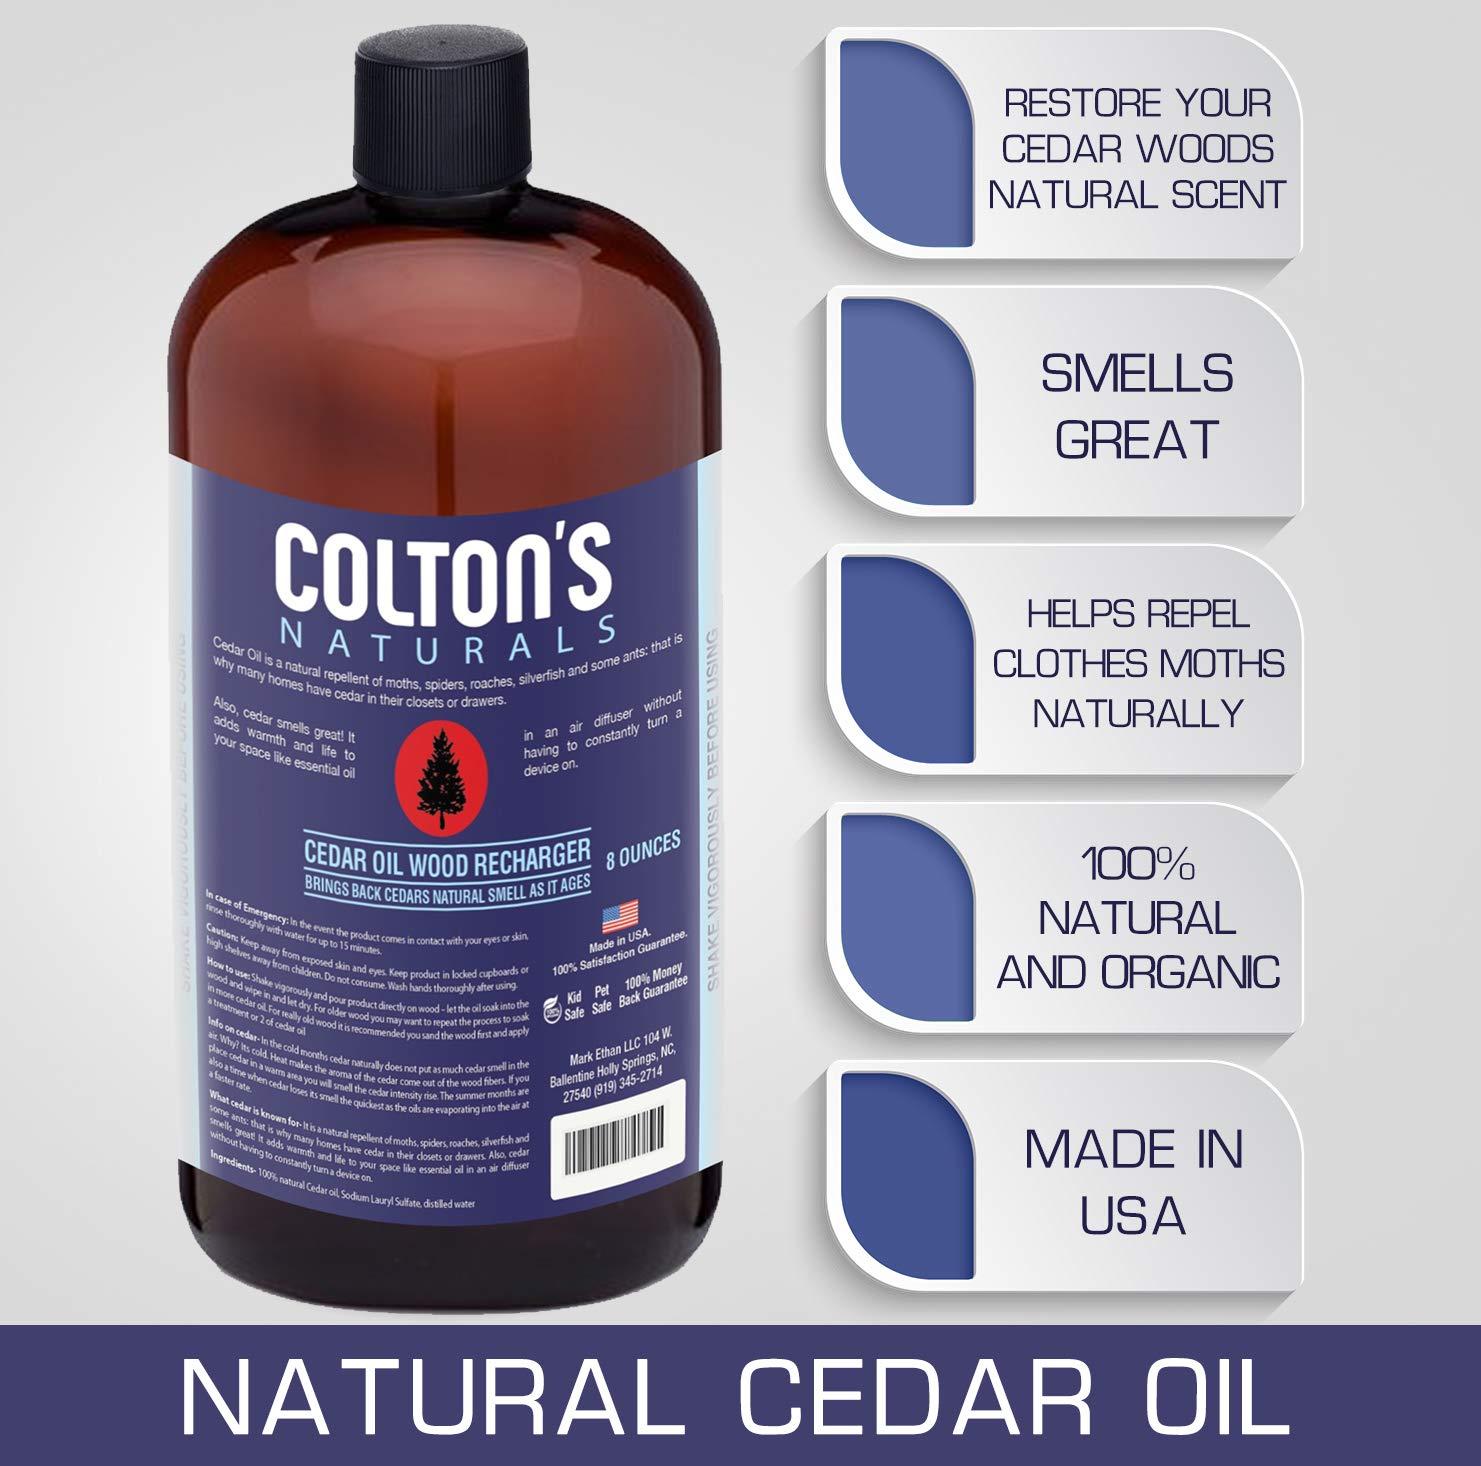 Colton's Naturals Cedar Oil Wood Replenish & Restore Original Cedar Scent (8 Ounces) by Colton's Naturals (Image #1)